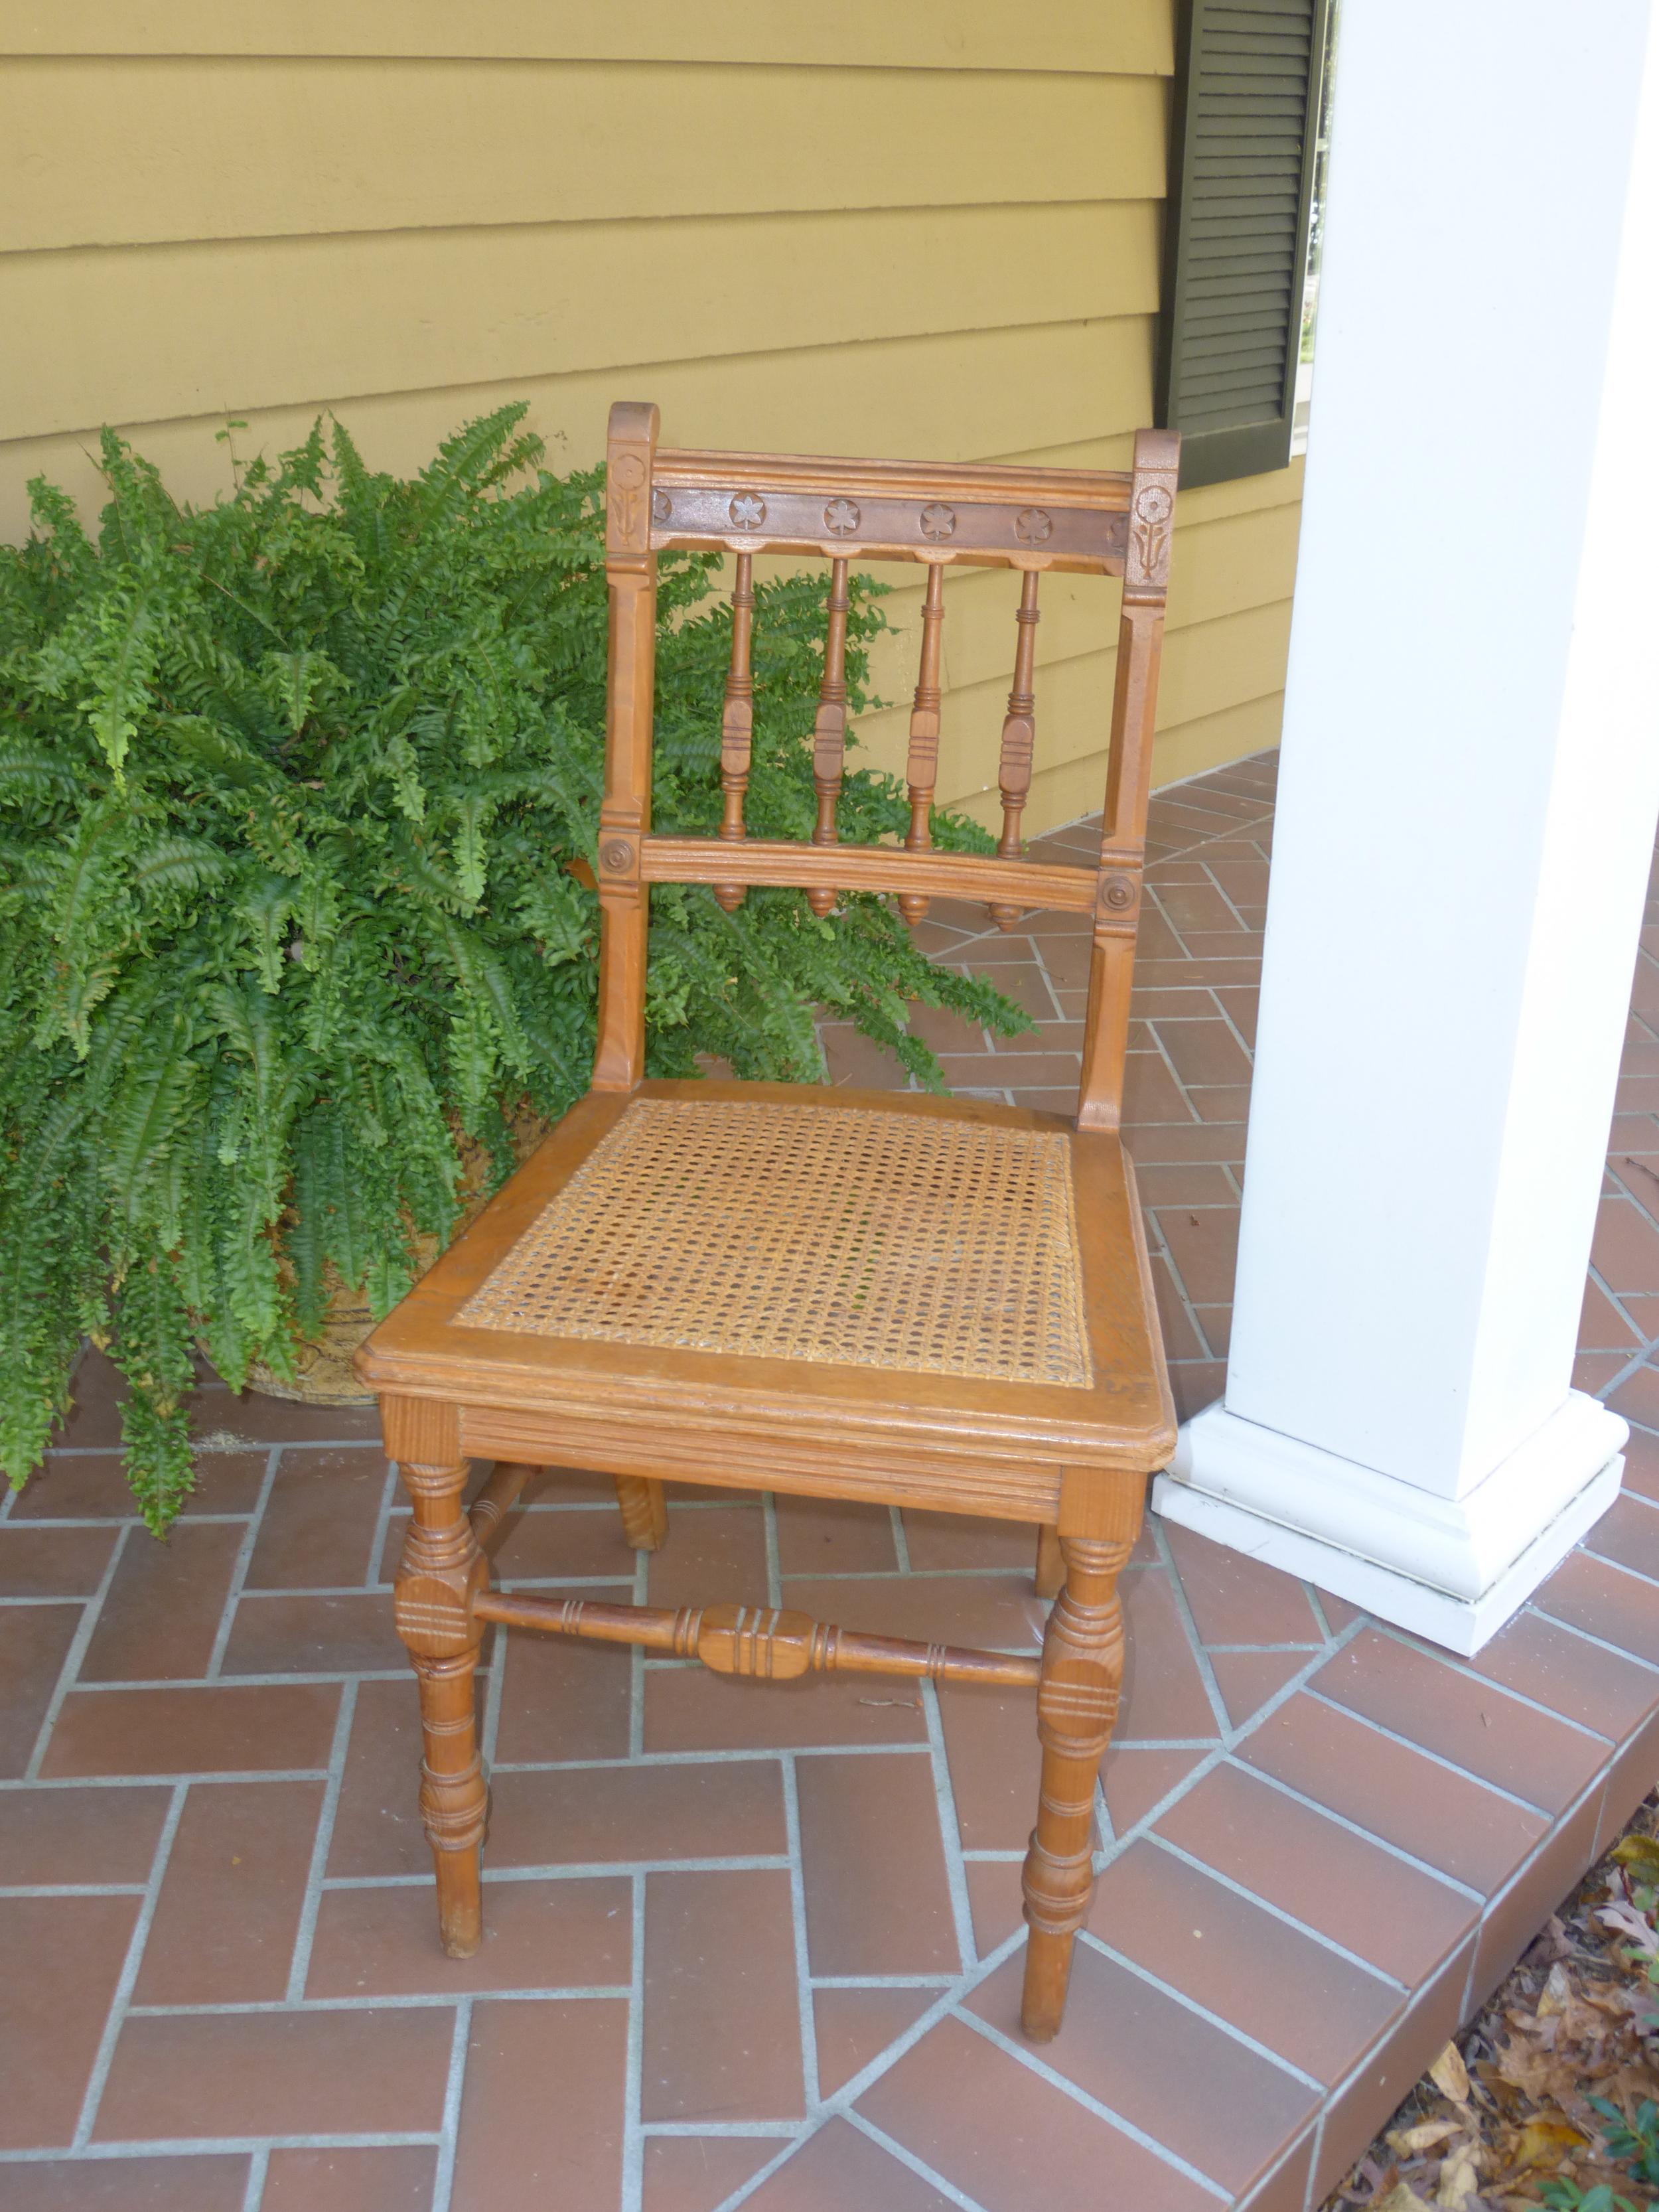 Eastlake cane seat side chair.